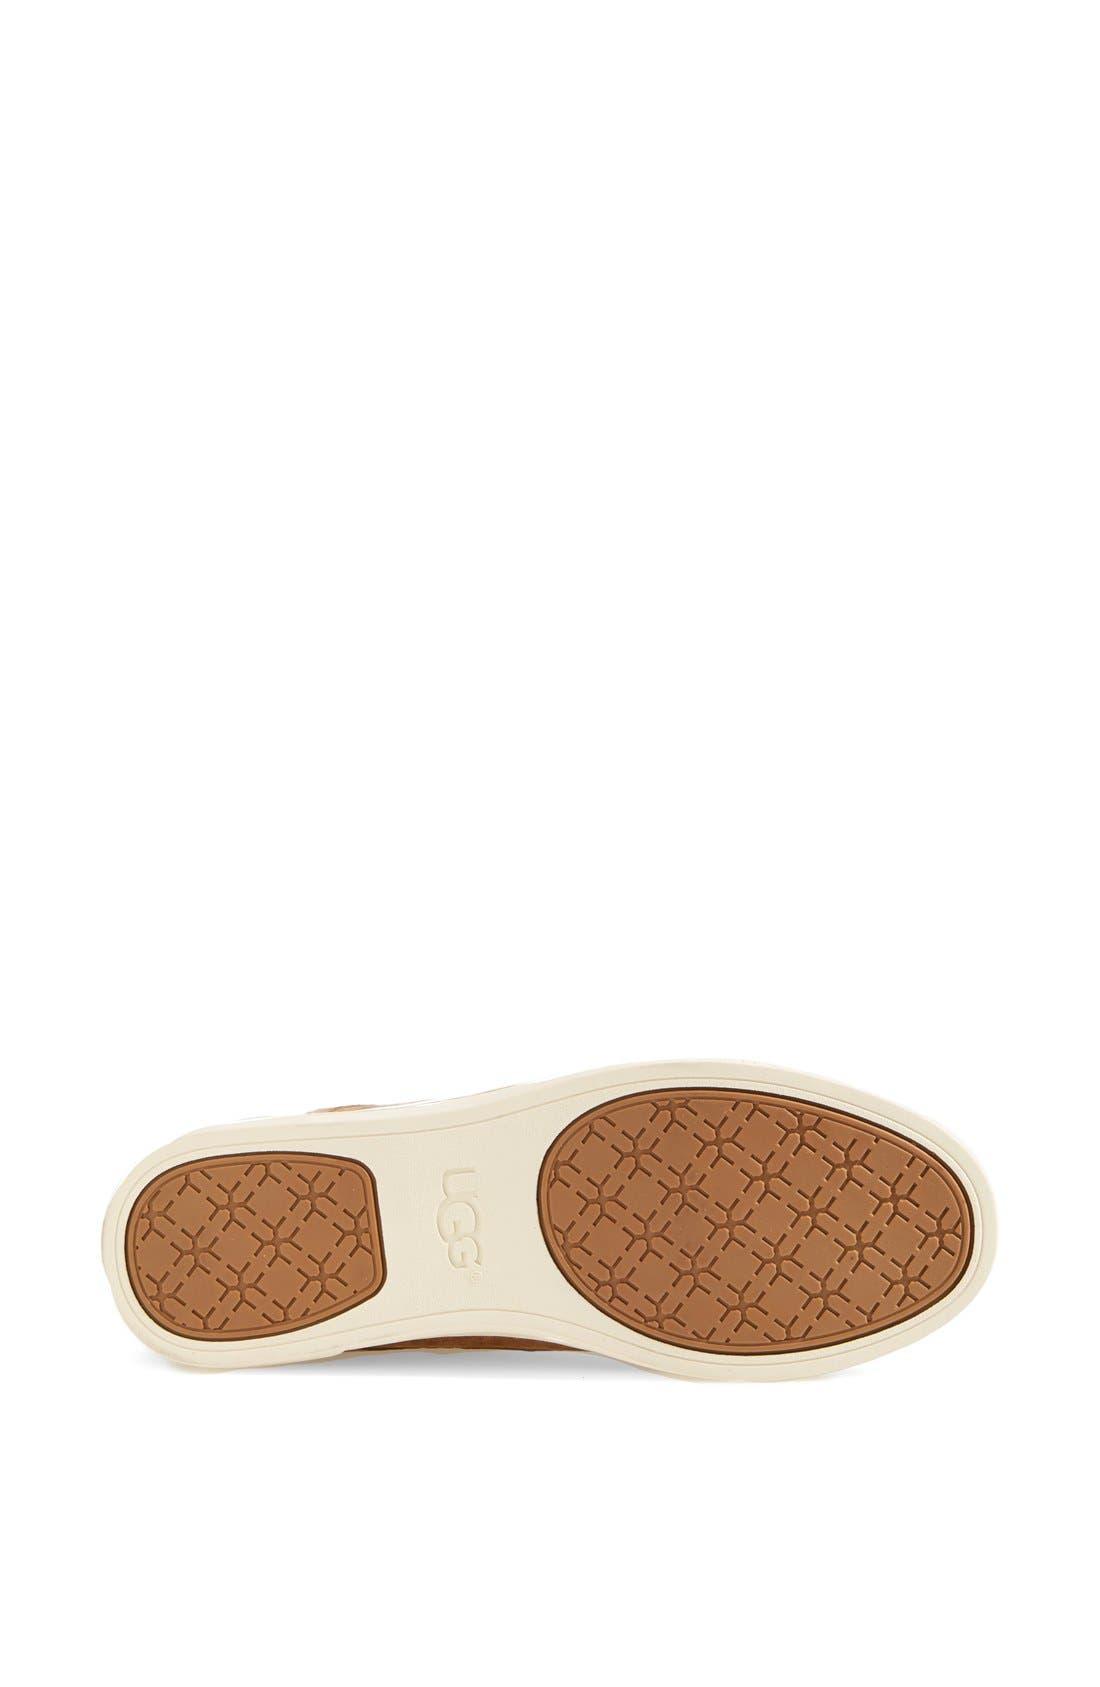 UGG<SUP>®</SUP>, Fierce Water Resistant Suede Slip-On Sneaker, Alternate thumbnail 4, color, 219